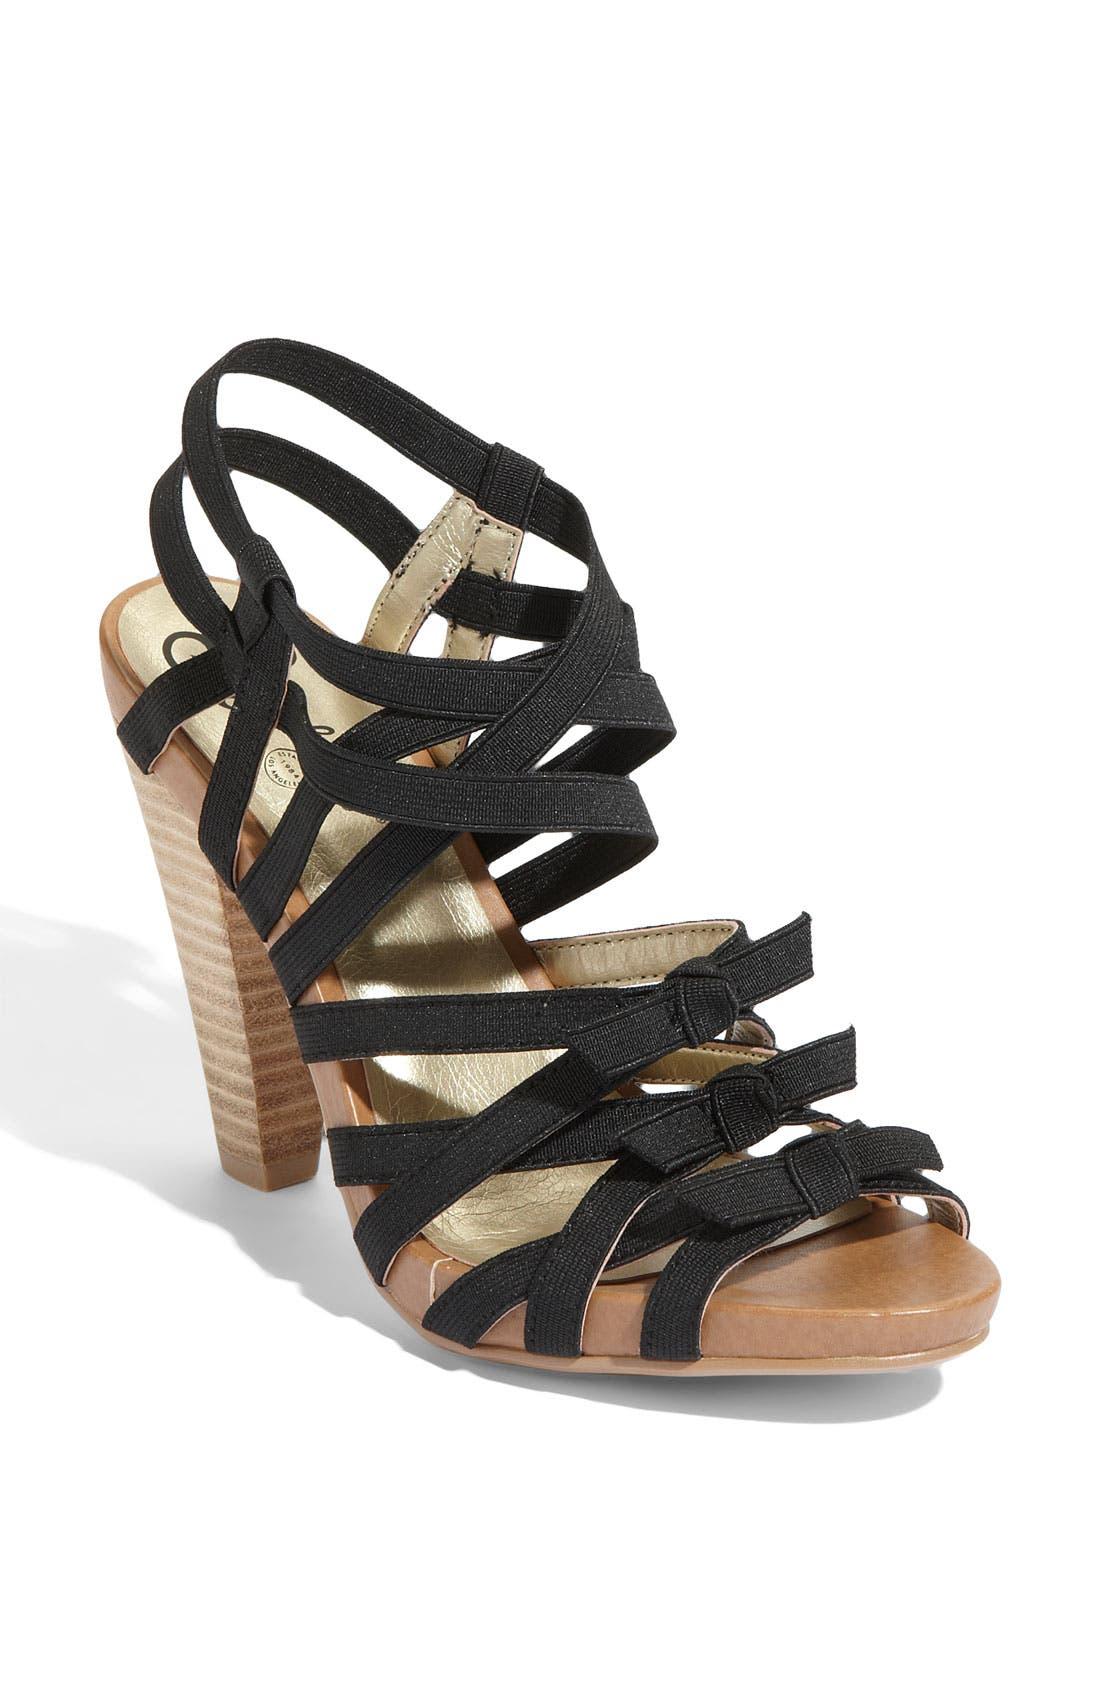 Alternate Image 1 Selected - Seychelles 'Hayworth' Elastic Sandal